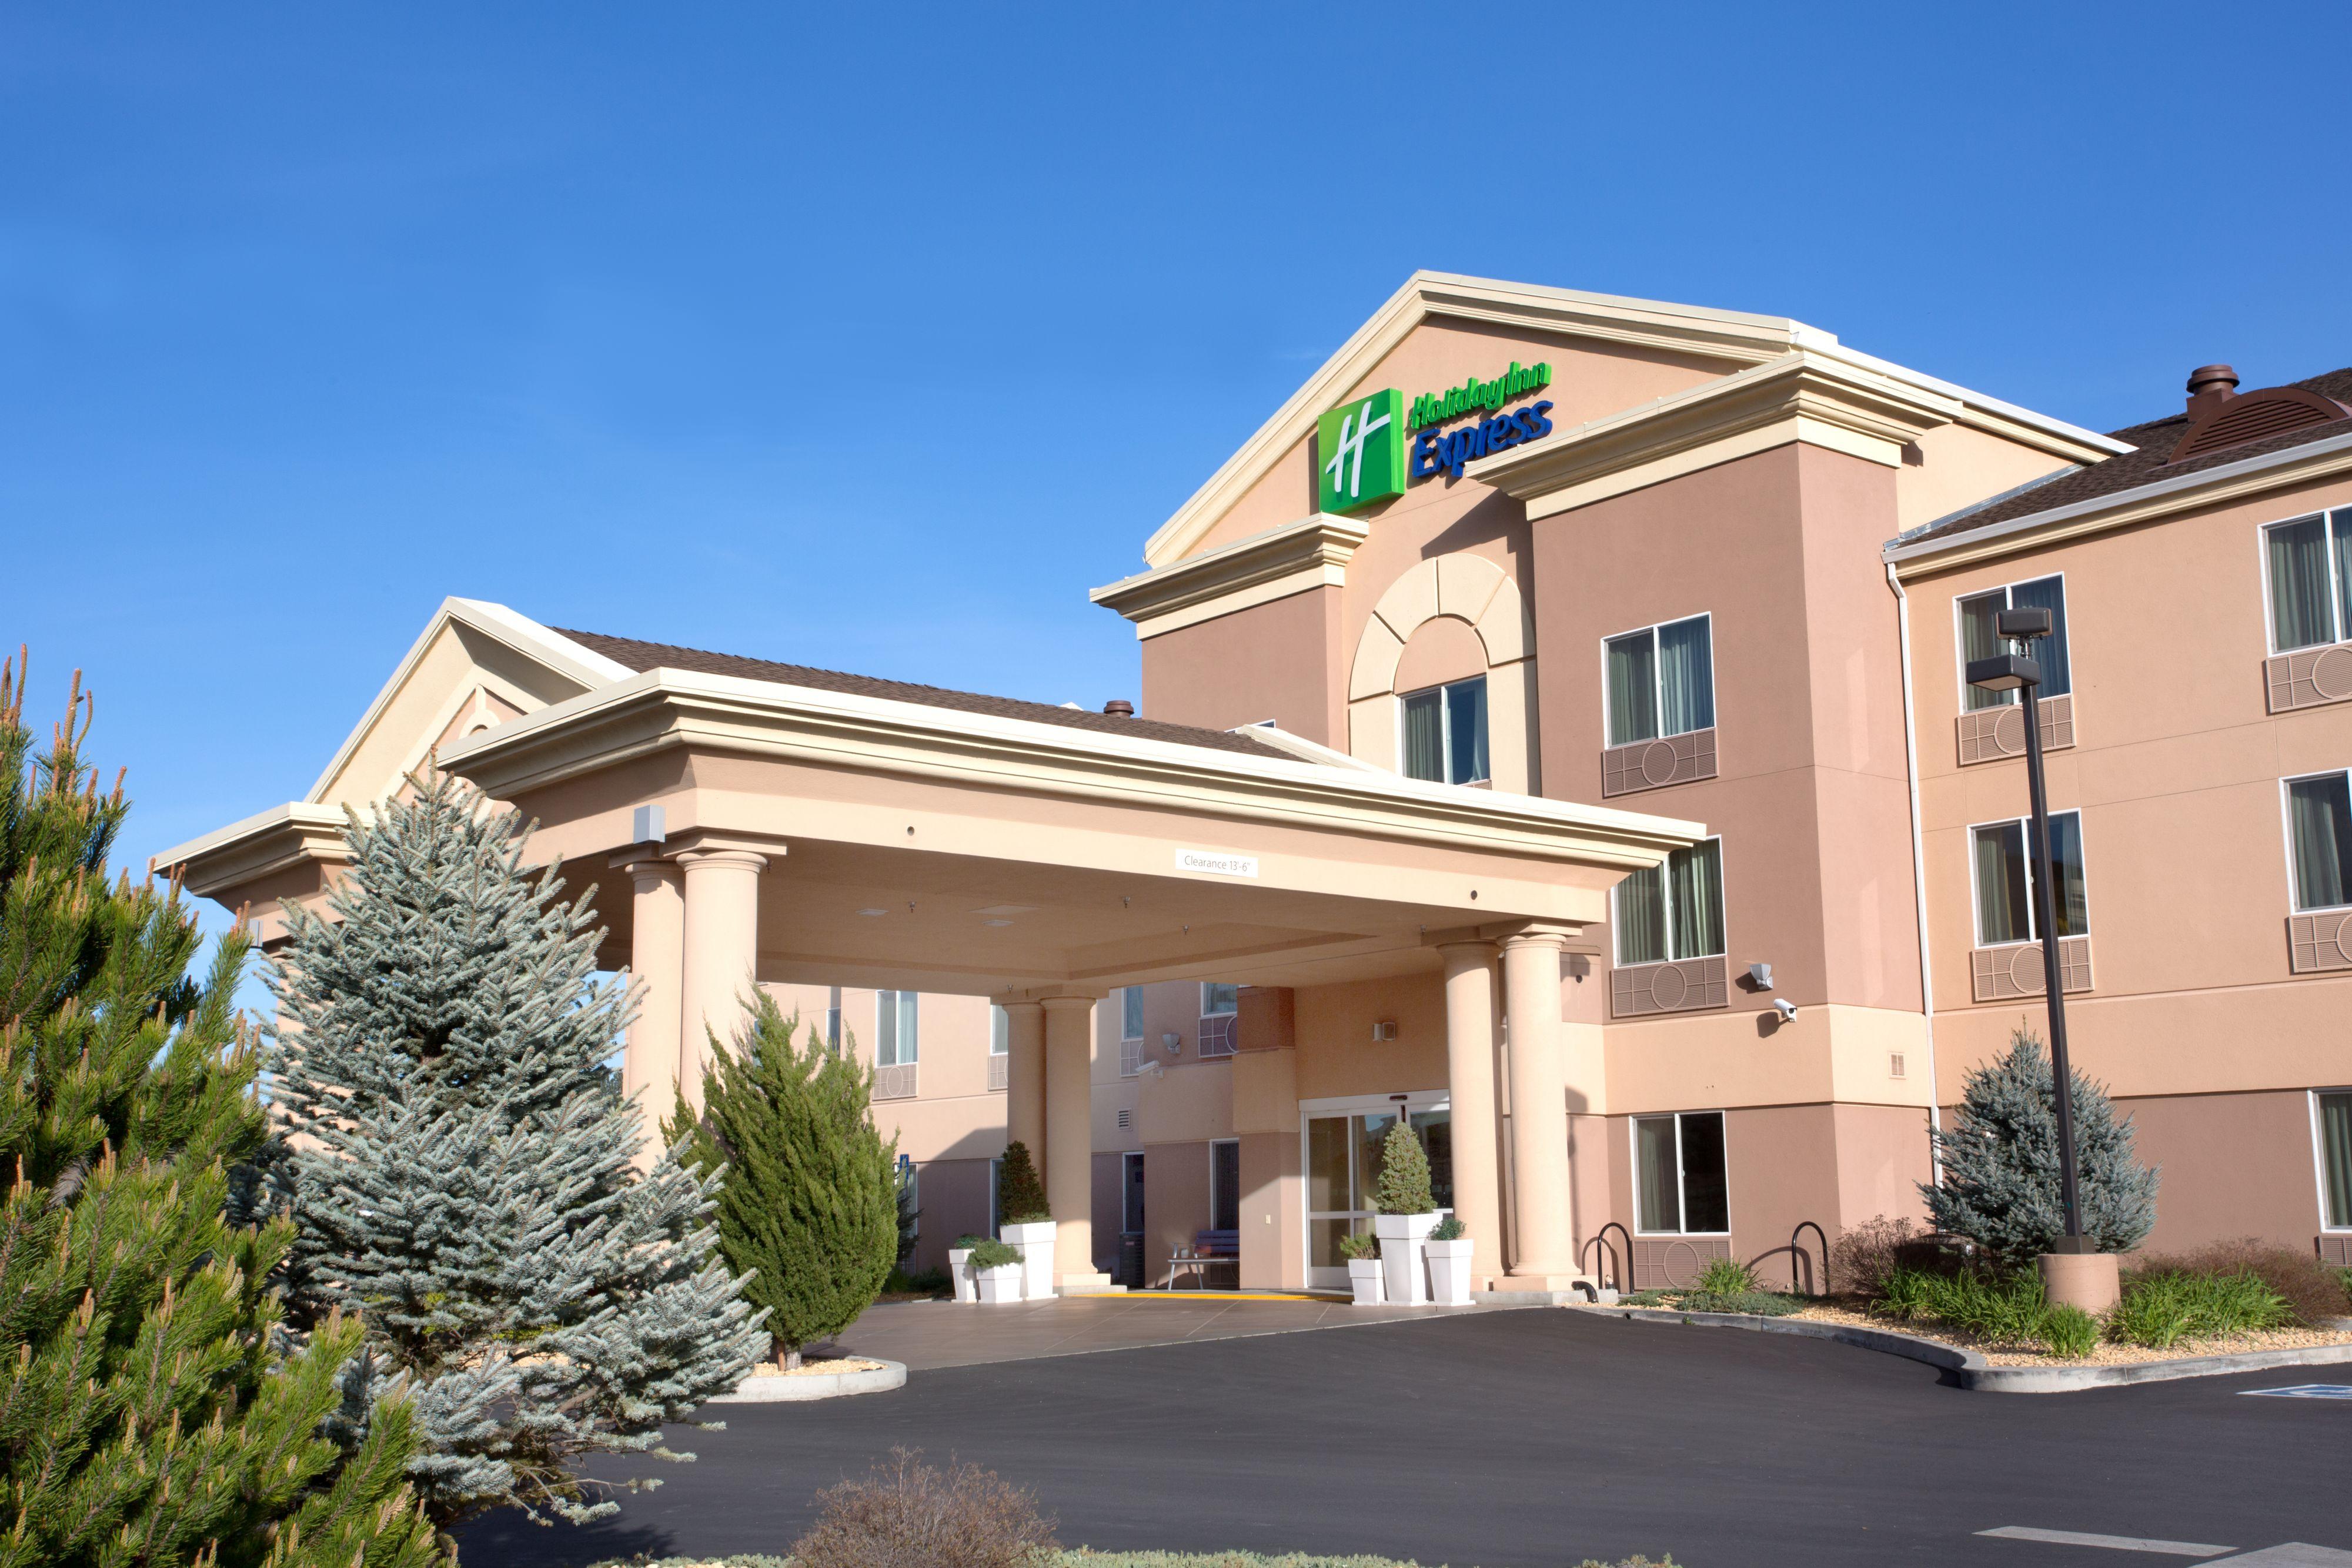 Holiday Inn Express Yreka-Shasta Area image 4